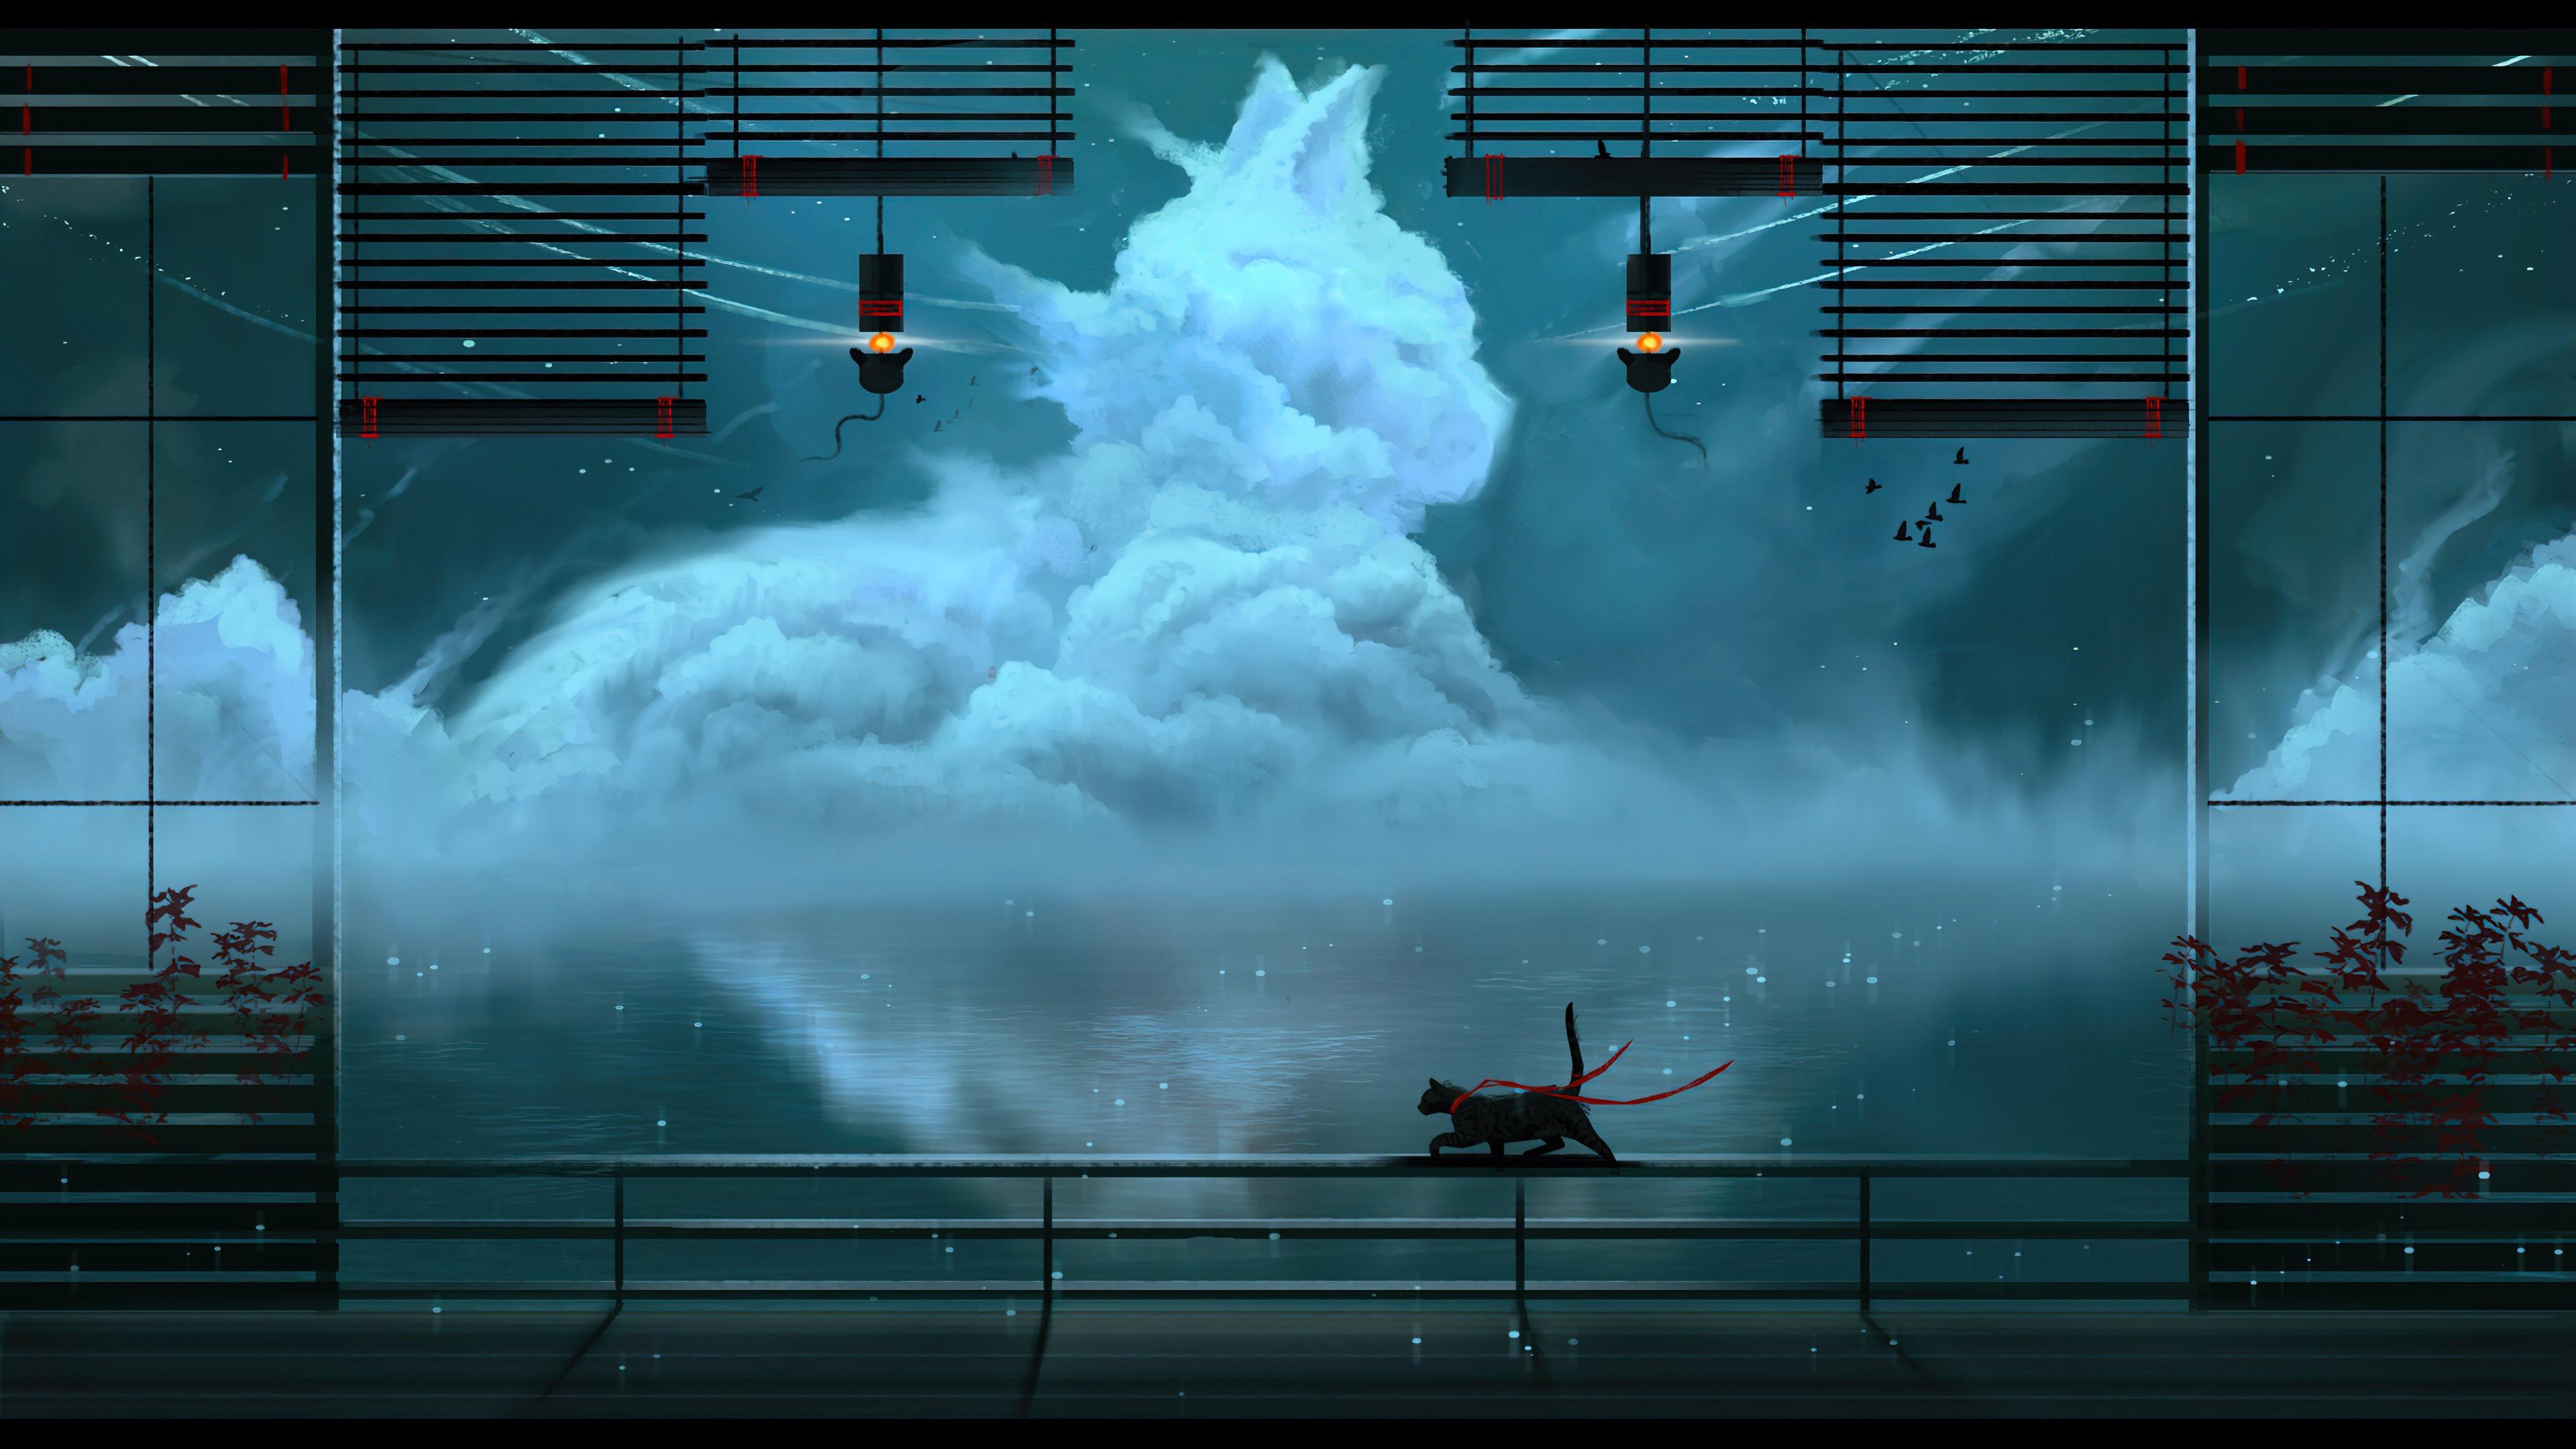 Wallpaper Clouds shaped like cat